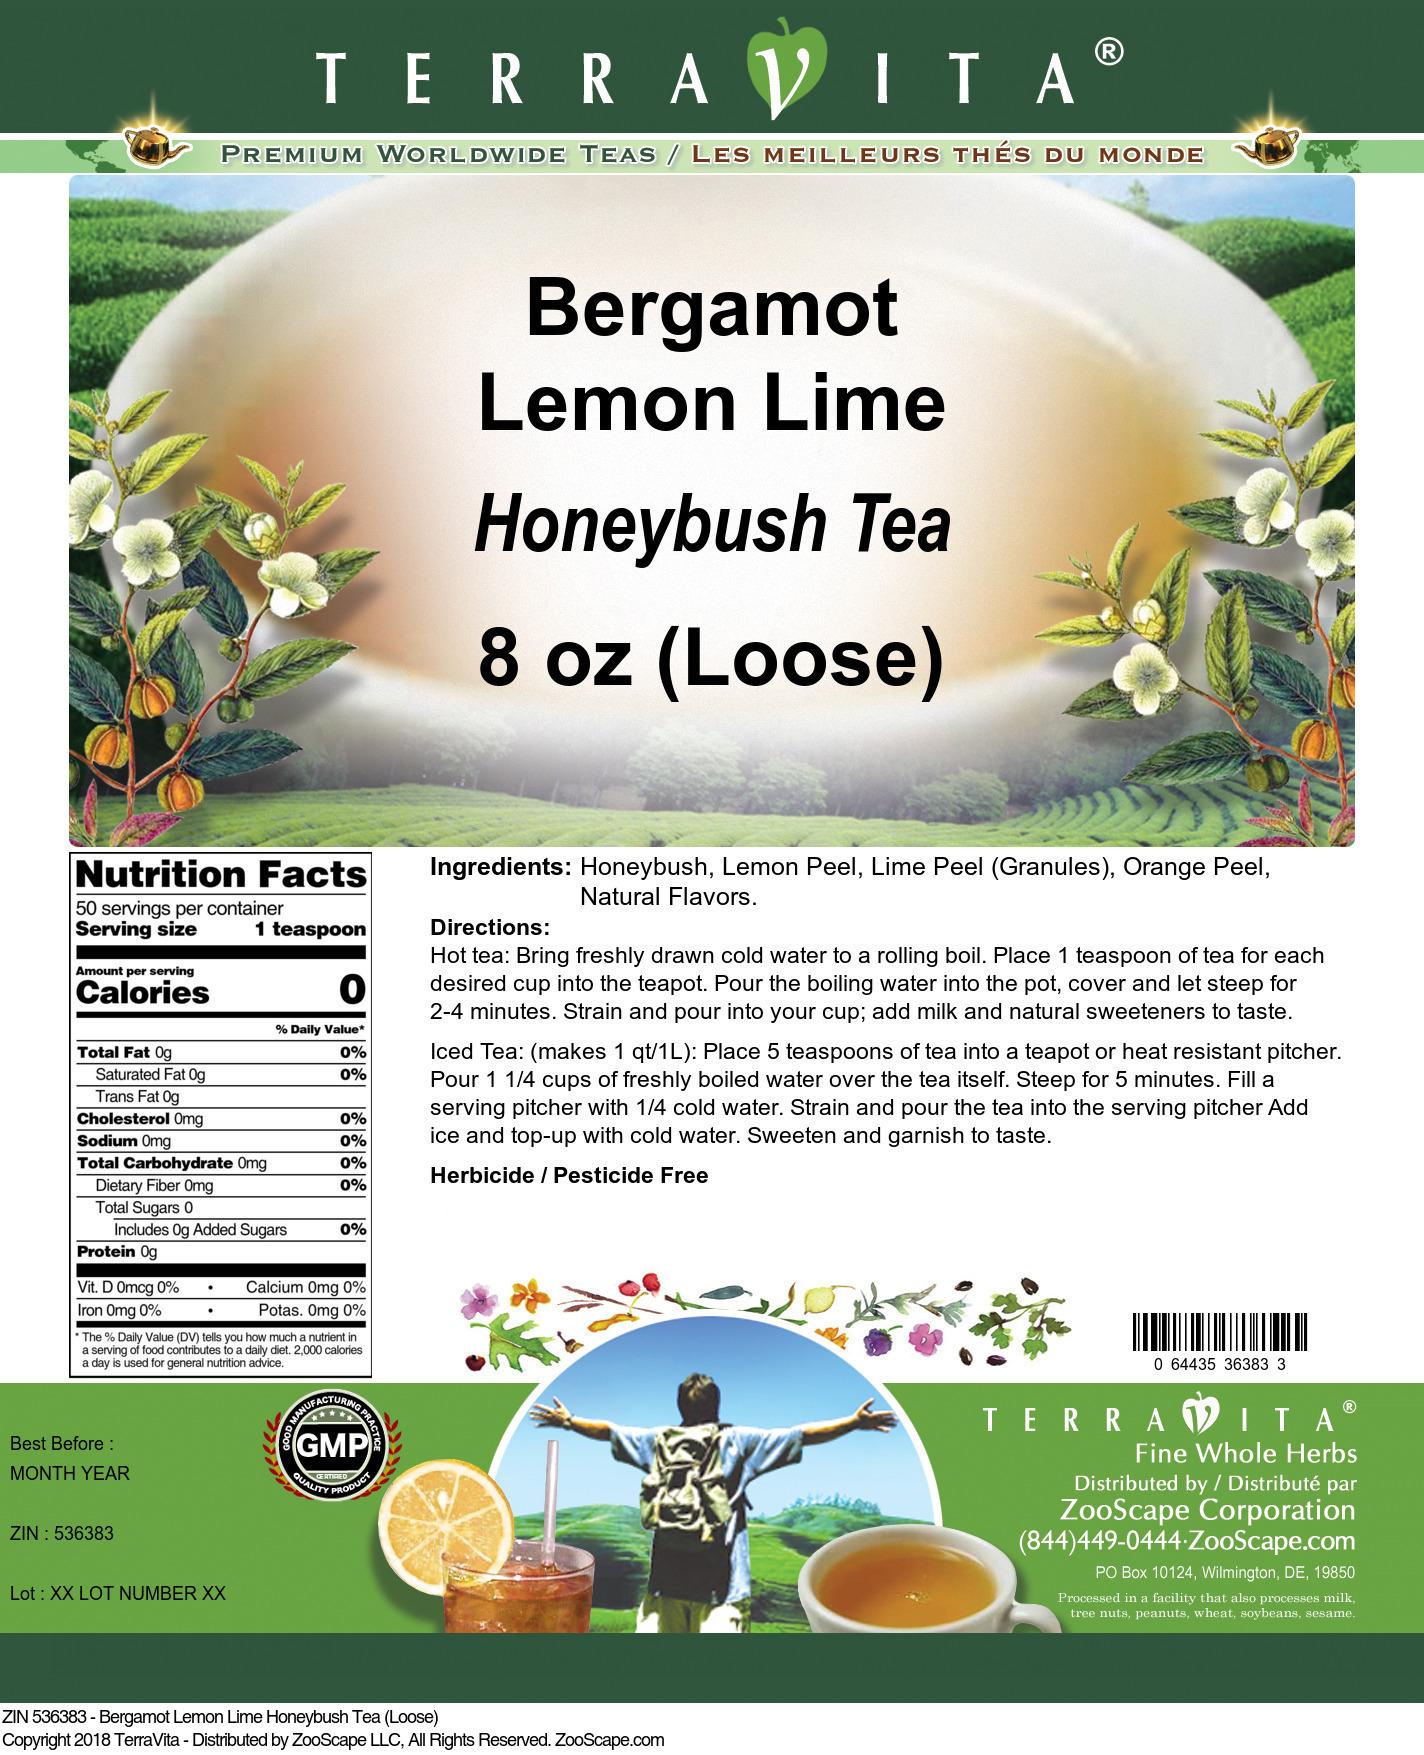 Bergamot Lemon Lime Honeybush Tea (Loose)